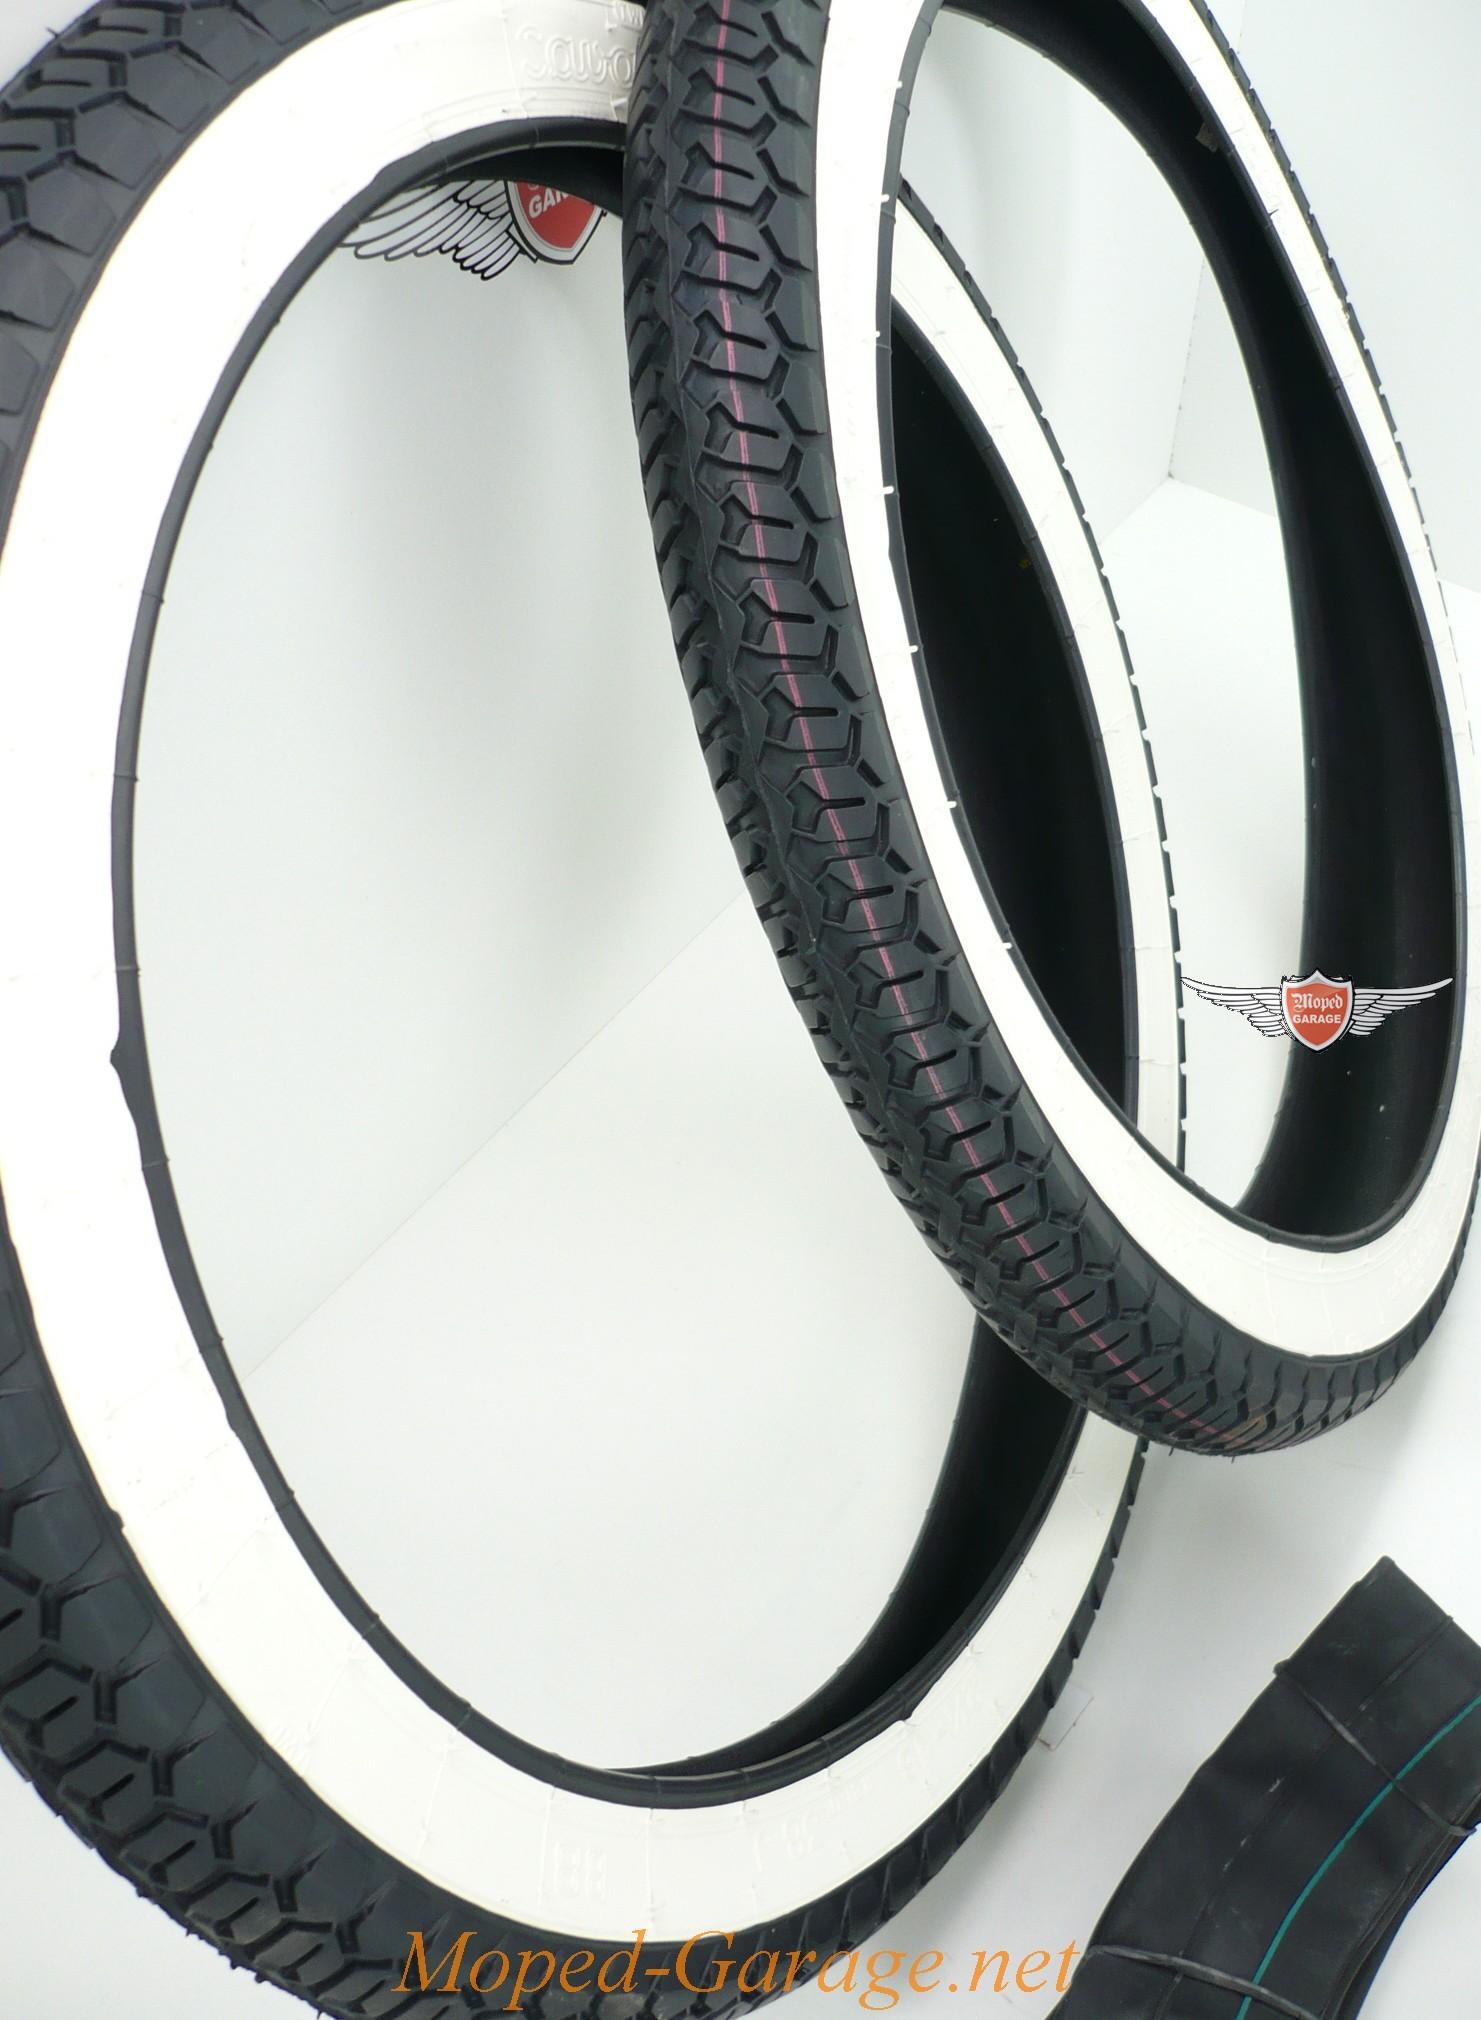 moped garelli mofa moped weisswand reifen. Black Bedroom Furniture Sets. Home Design Ideas